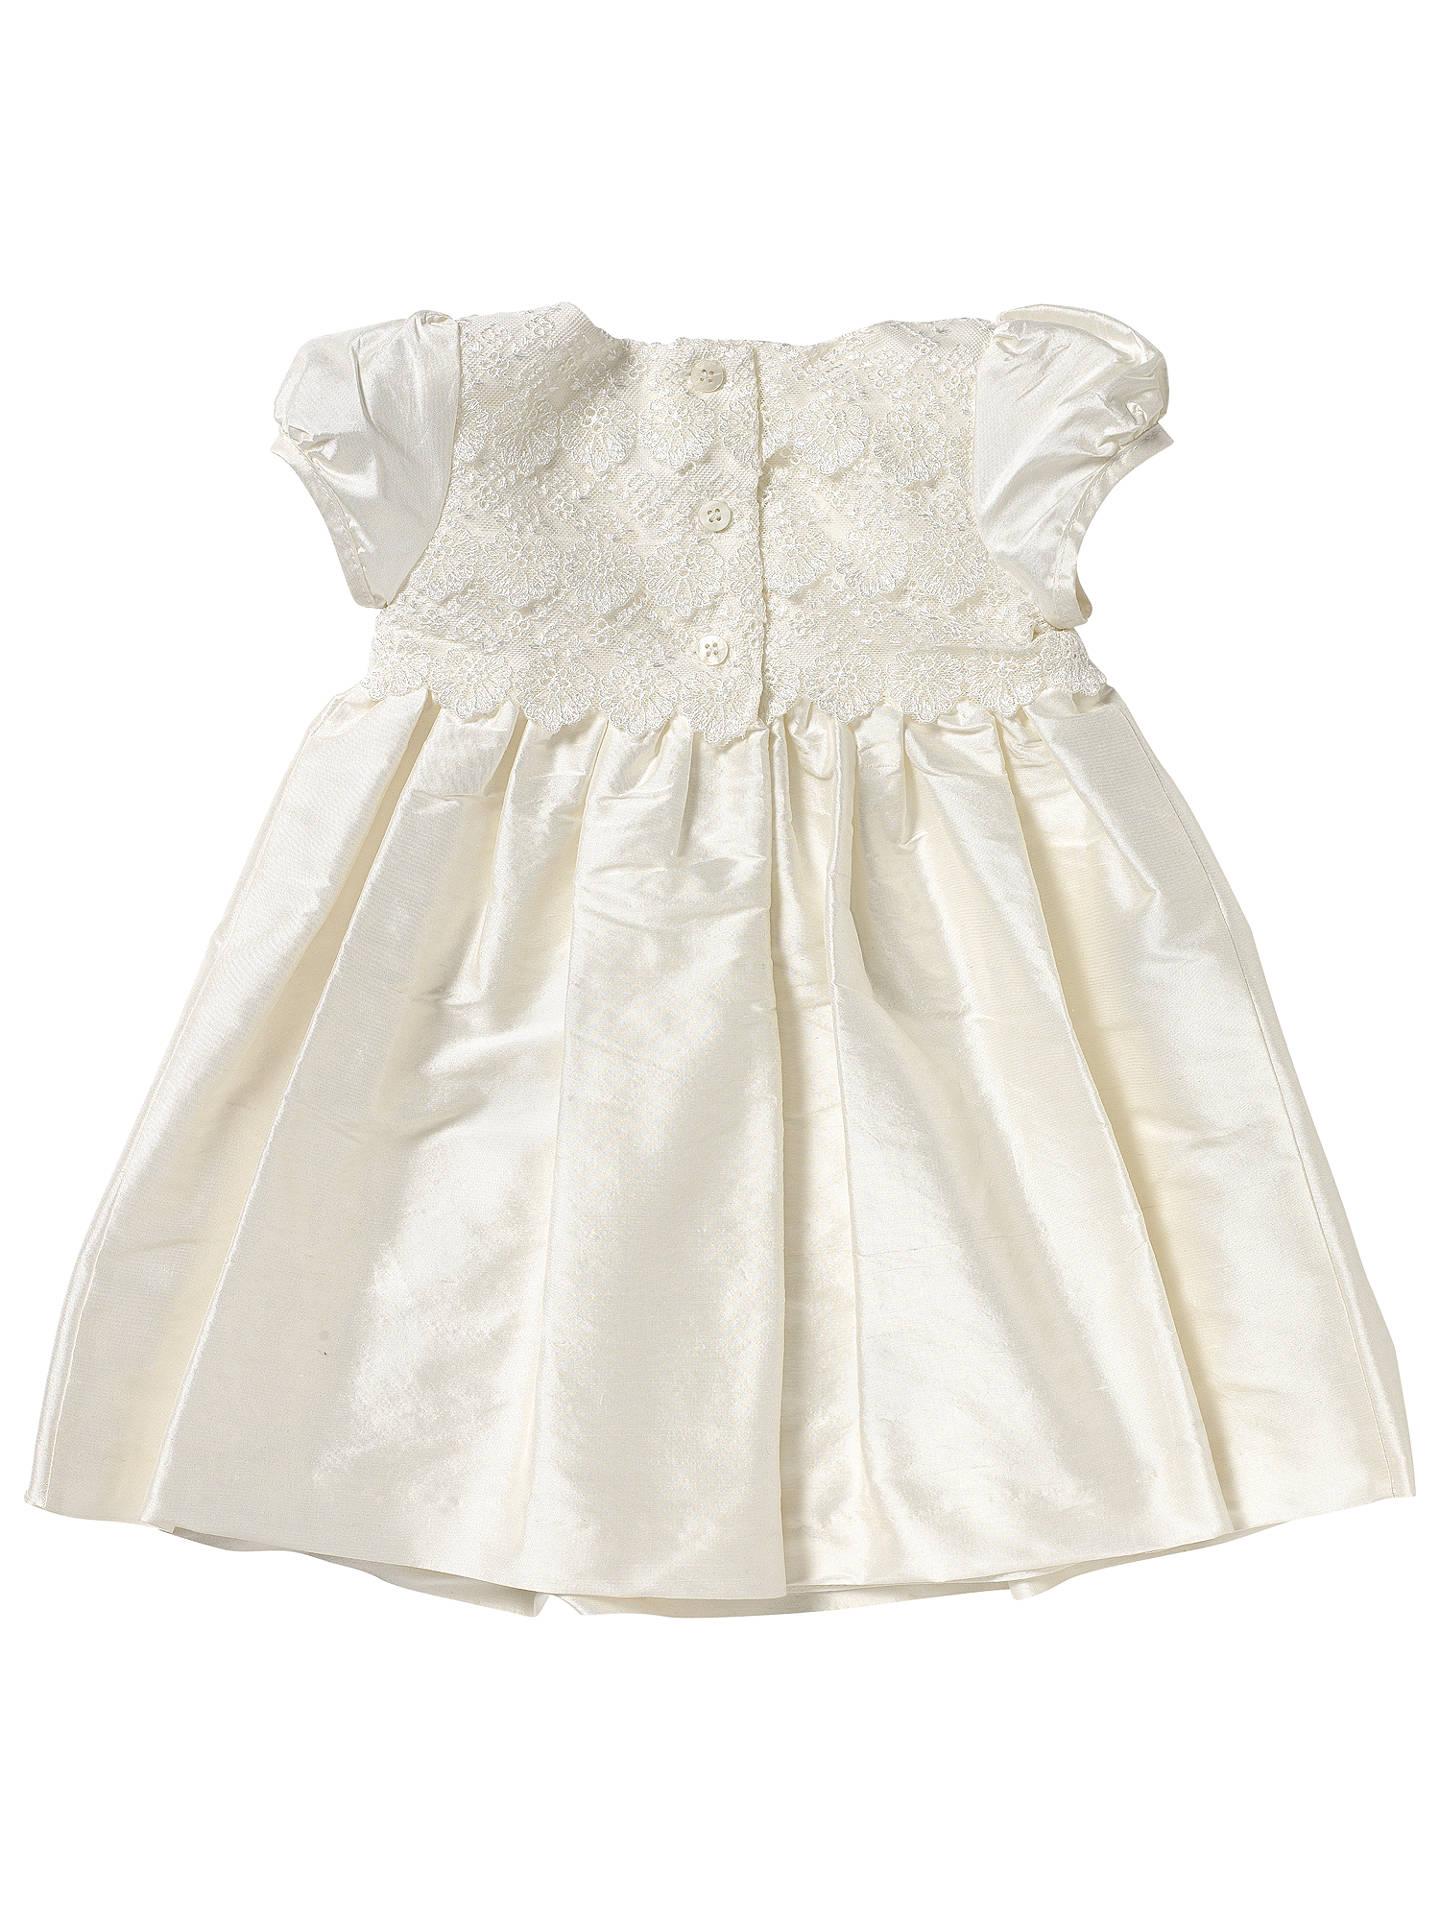 baf47c06d ... Buy John Lewis Baby Lace Silk Christening Dress, Cream, 0-3 months  Online ...